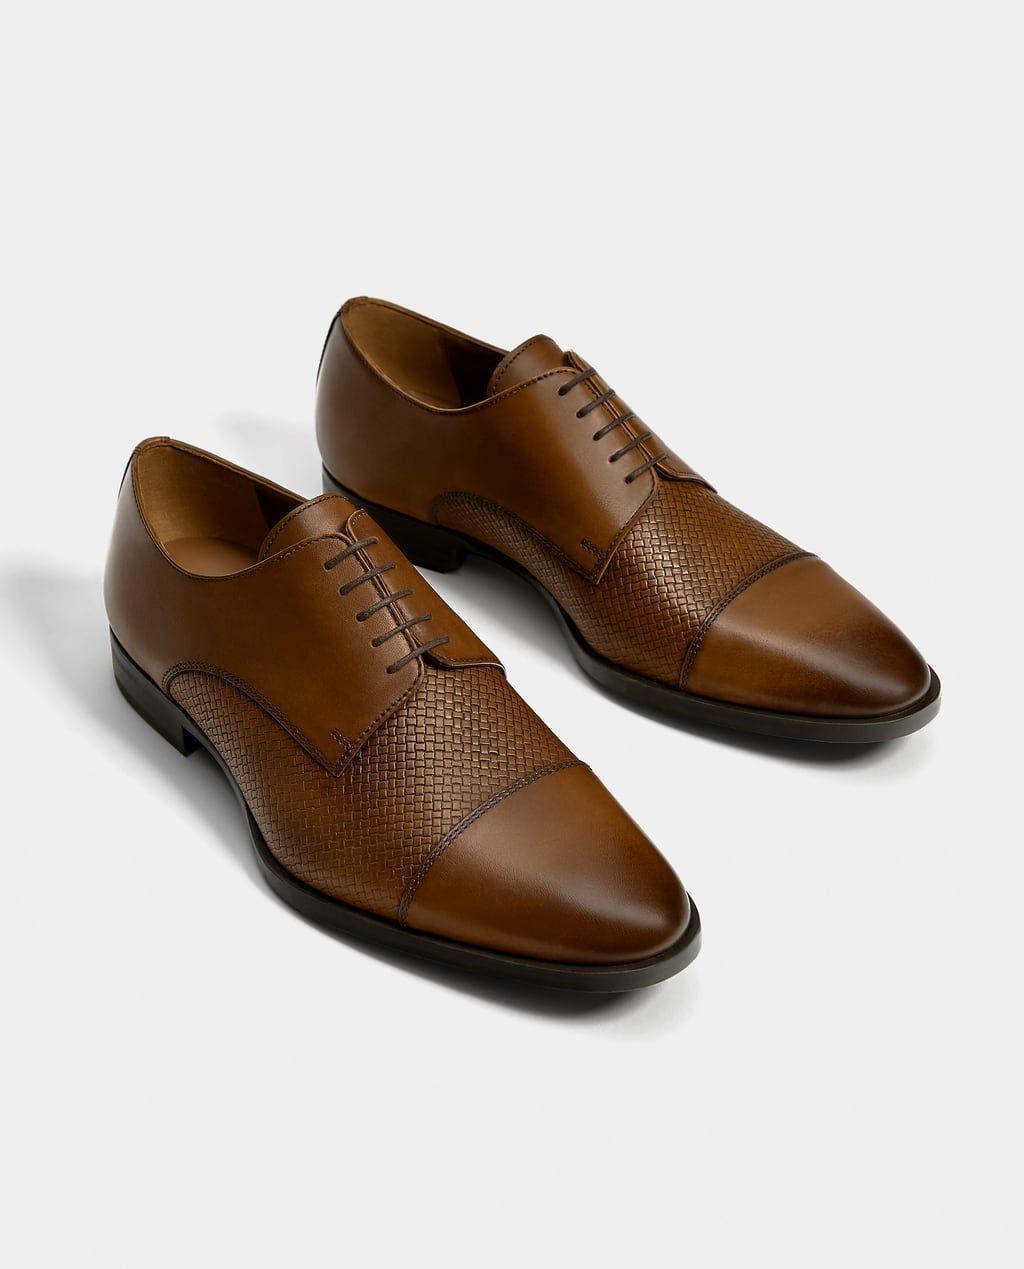 7719c4f56 Imagen relacionada Sapatos Masculinos, Sapato Marrom, Modelos De Sapatos,  Sapatos De Noiva,